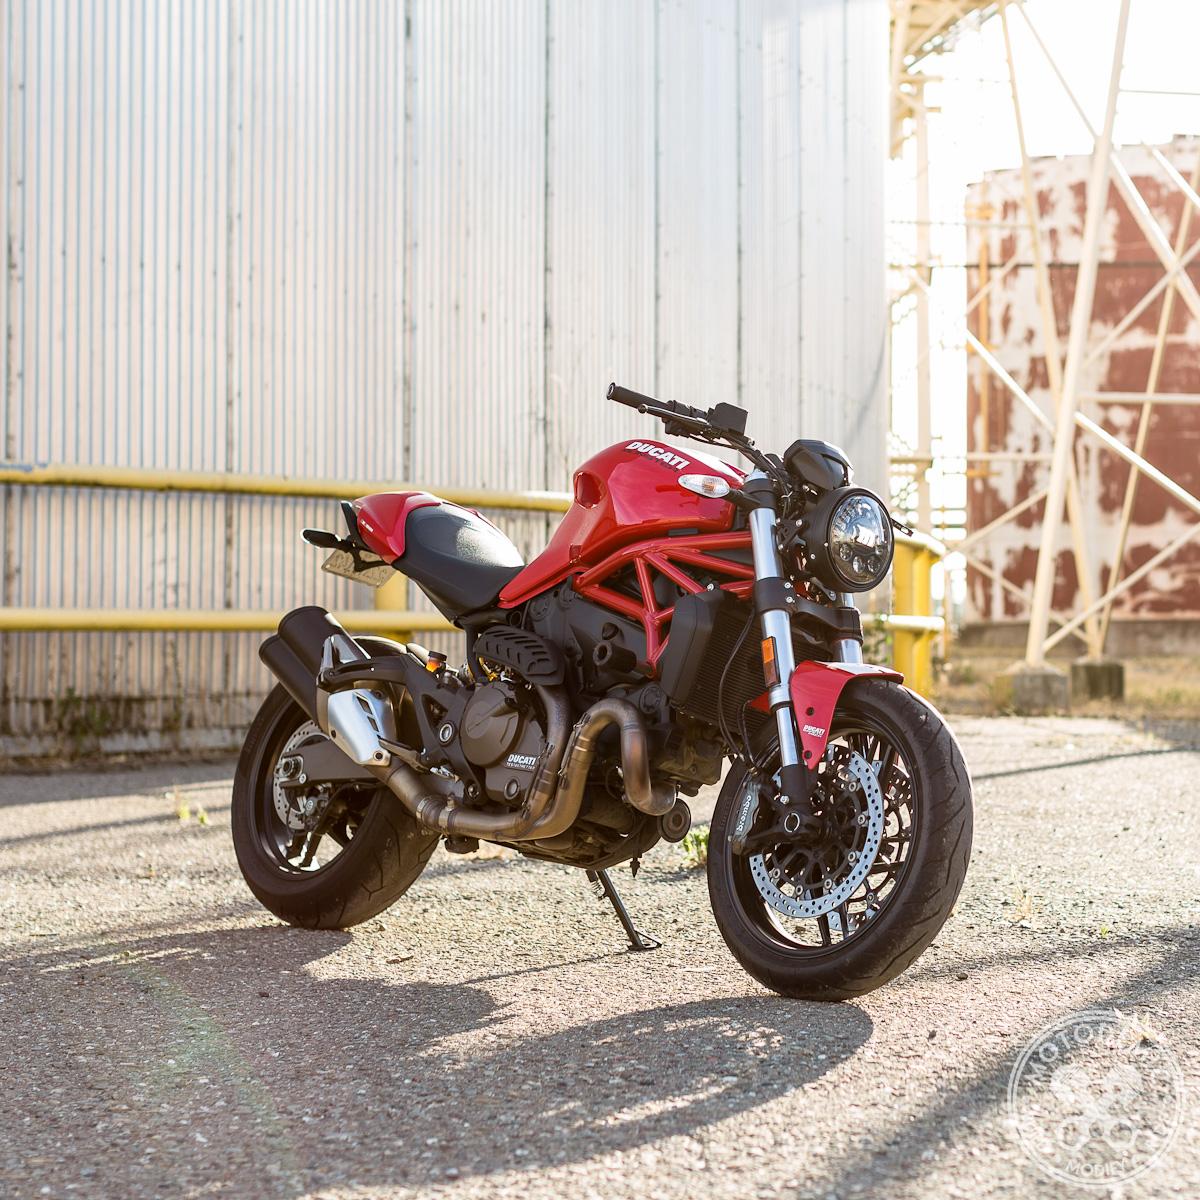 Ducati Monster Headlight Conversion 821 1200 Motodemic